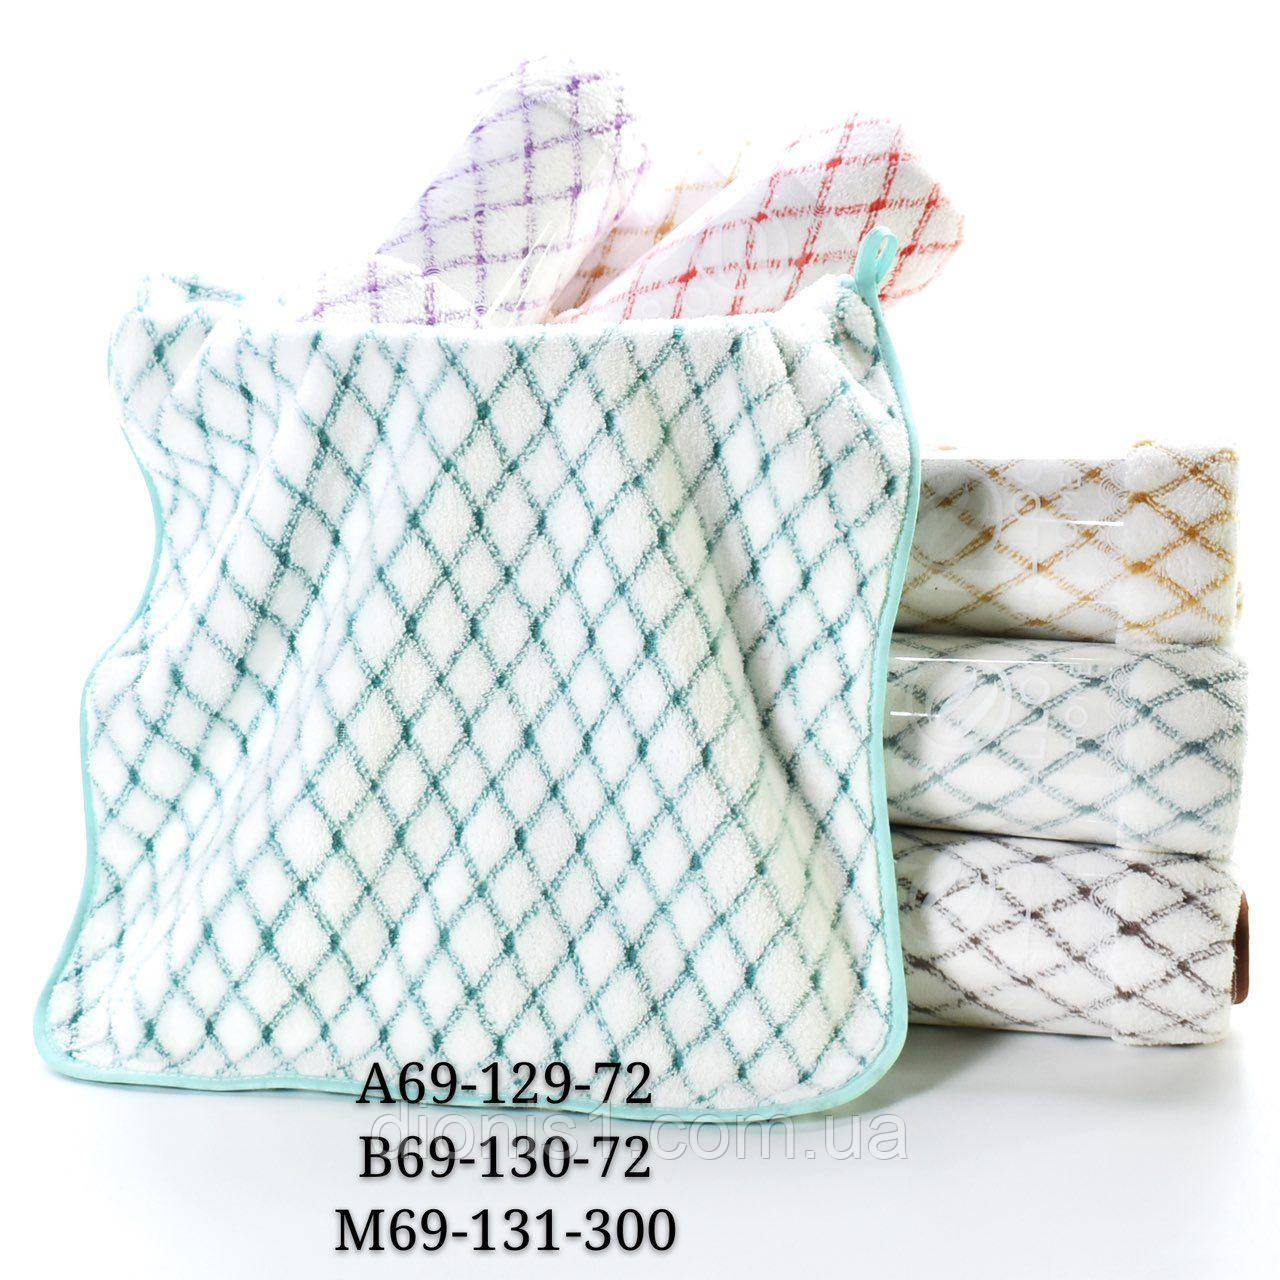 Кухонные полотенца ромбик фибра 35х70 6шт в уп